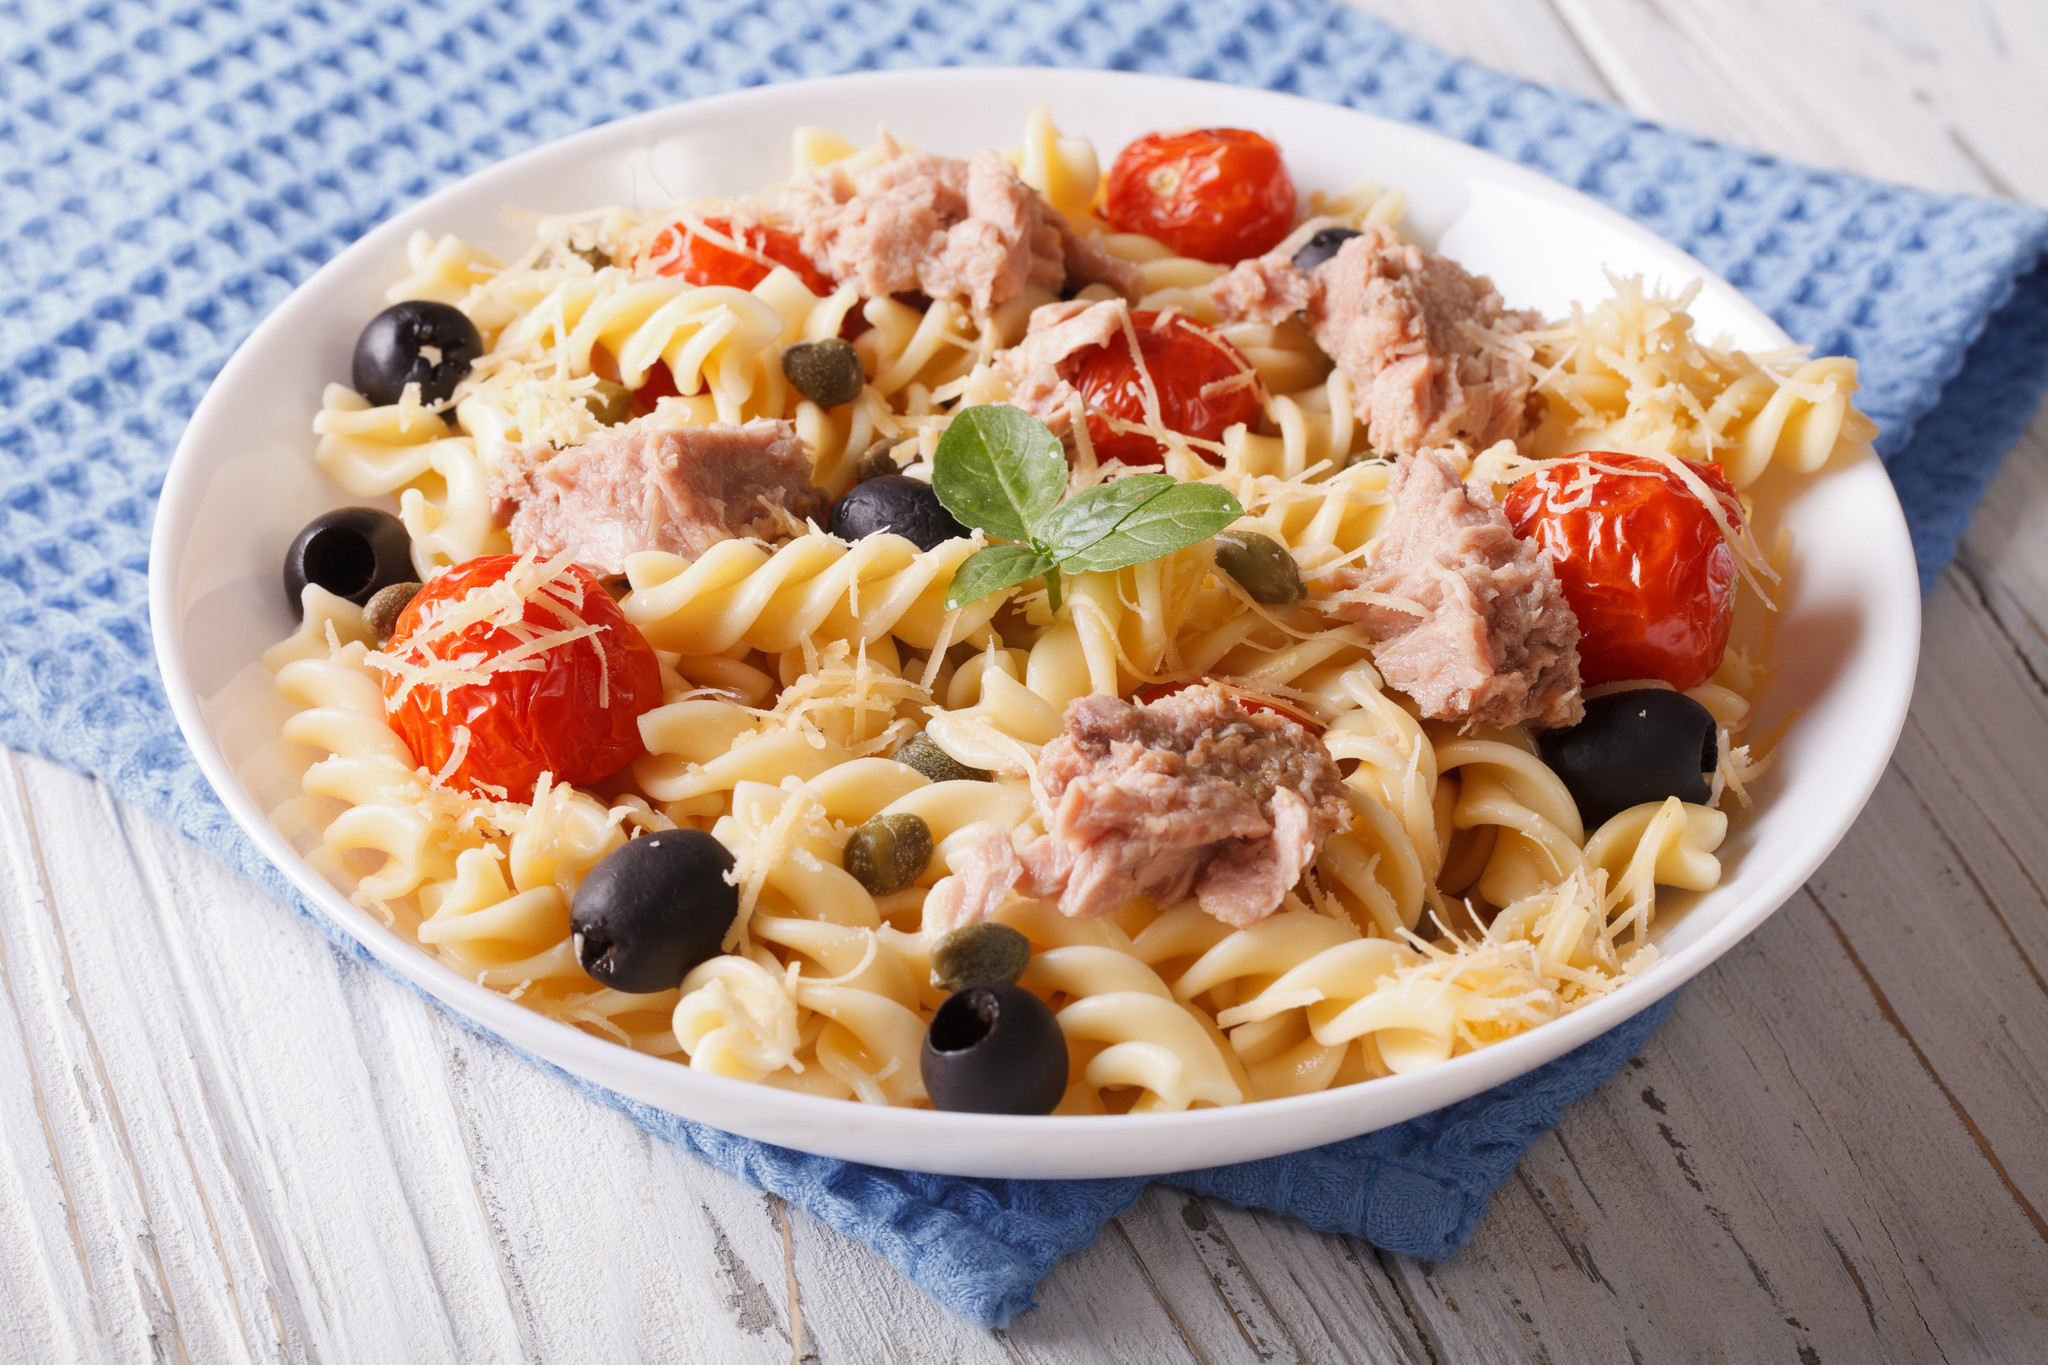 Tonijnschotel met gnocchi-pasta, arrabiata saus & groenten